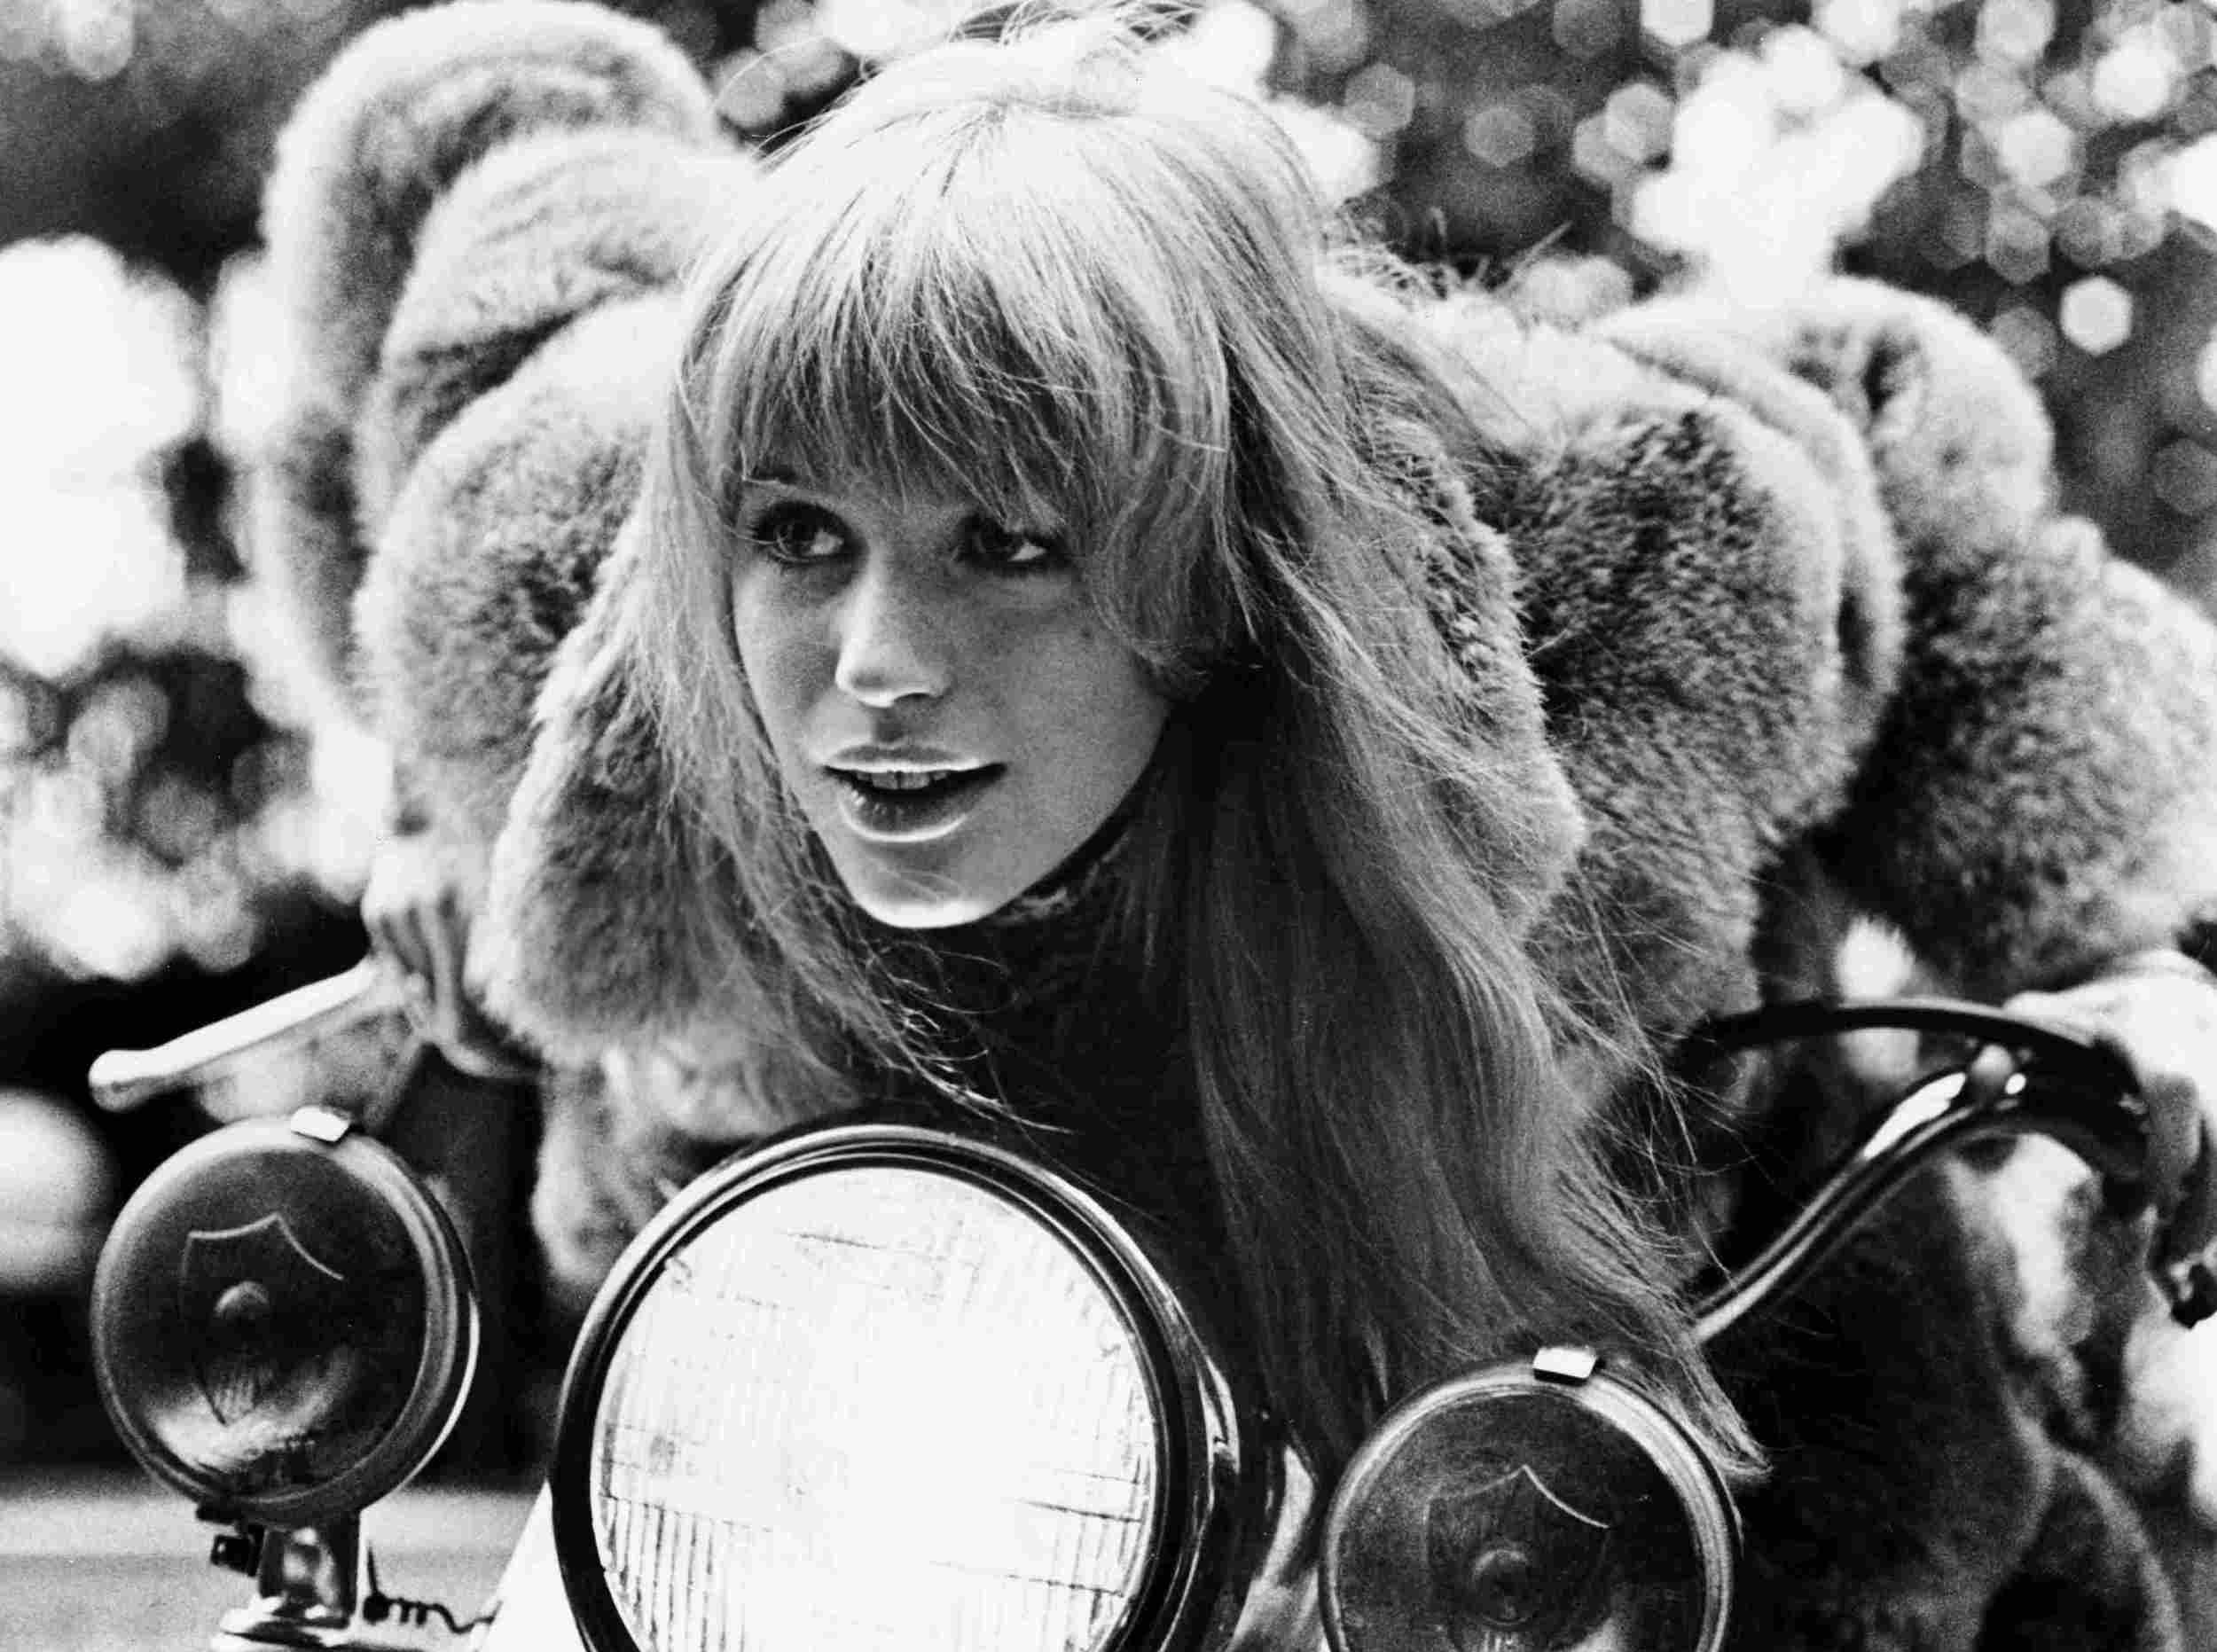 girl-on-a-motorcycle1.jpg